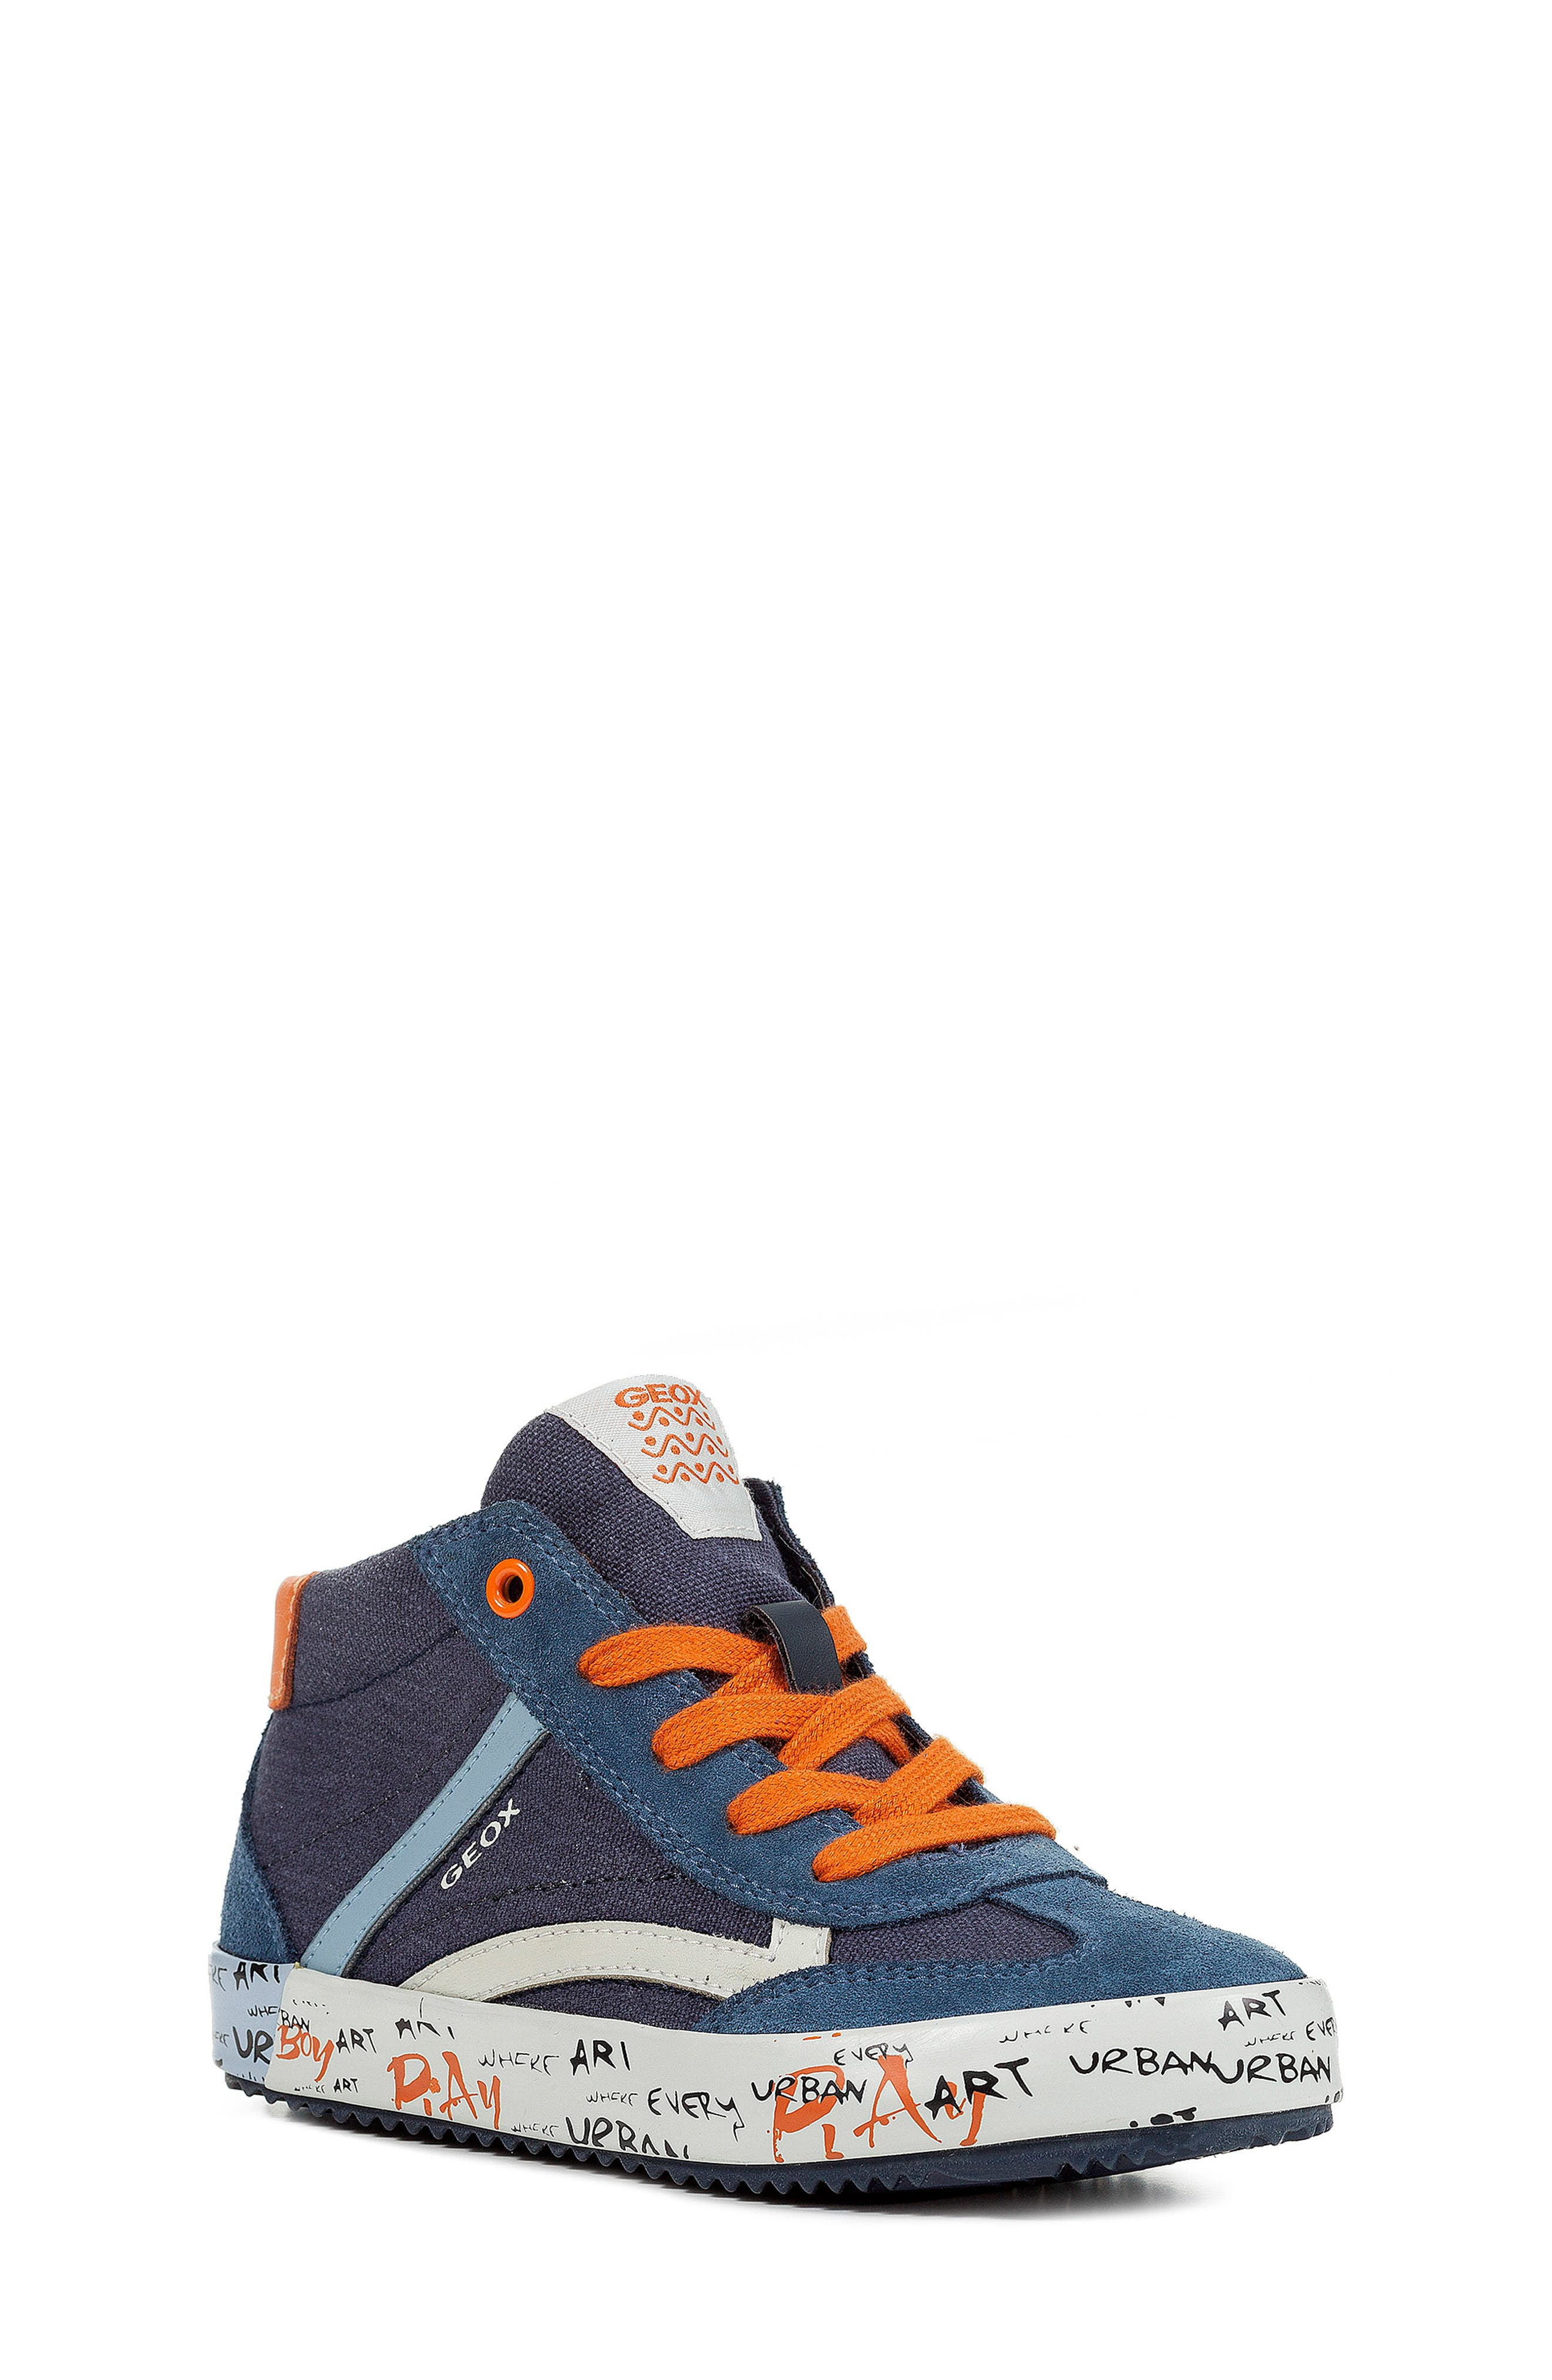 Alonisso 34 High Top Sneaker, Main, color, NAVY/ DARK ORANGE